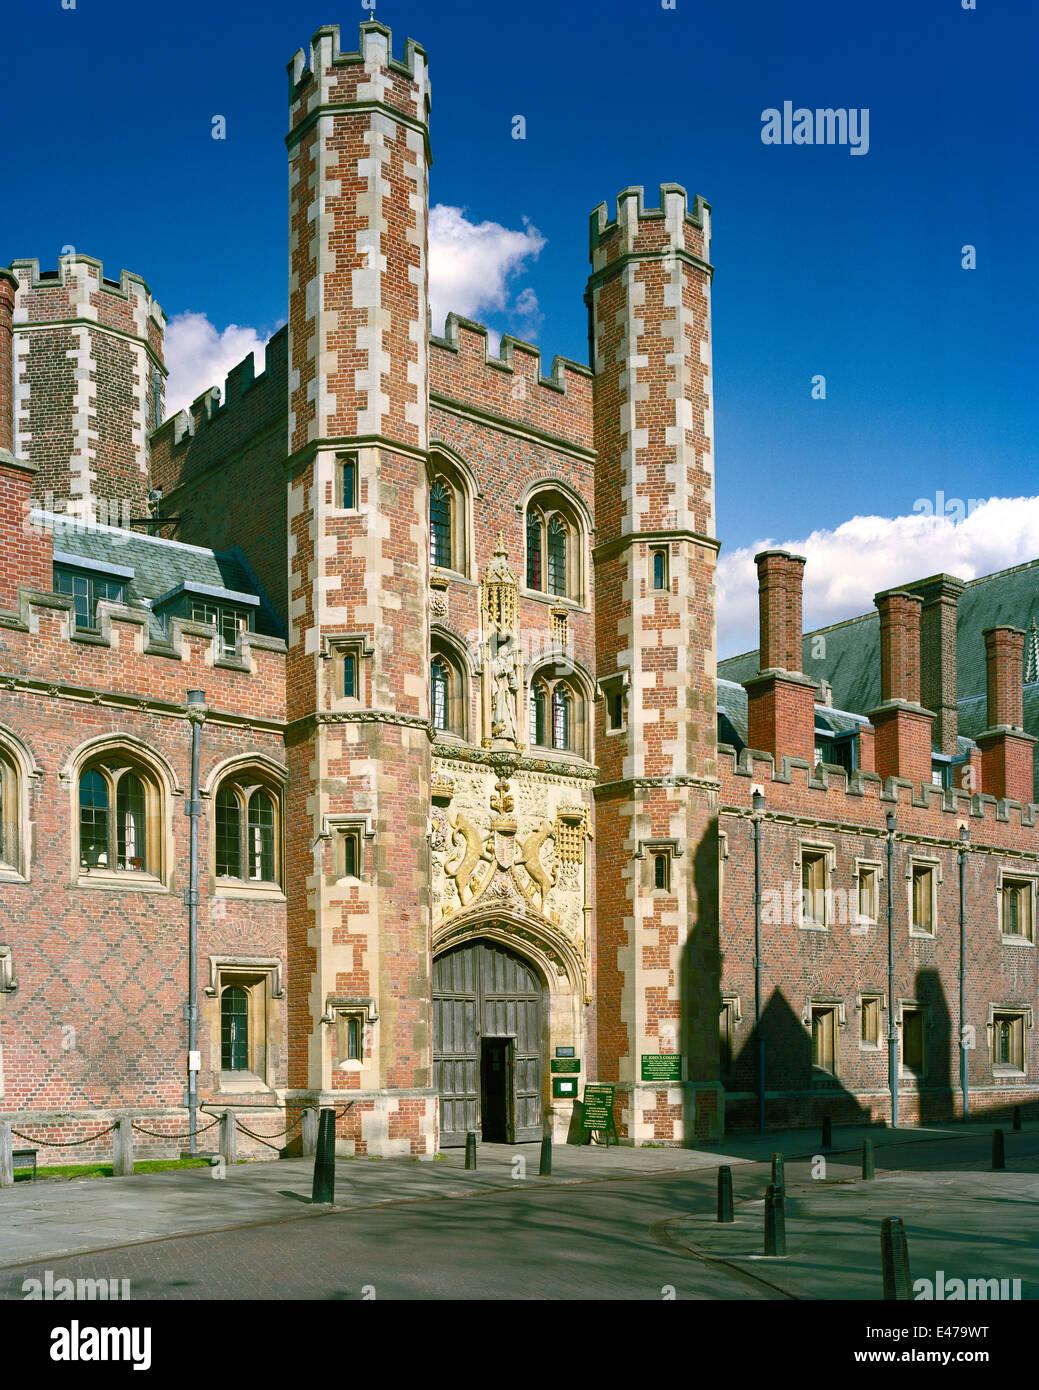 Great Gate of St John's College Cambridge - Stock Image